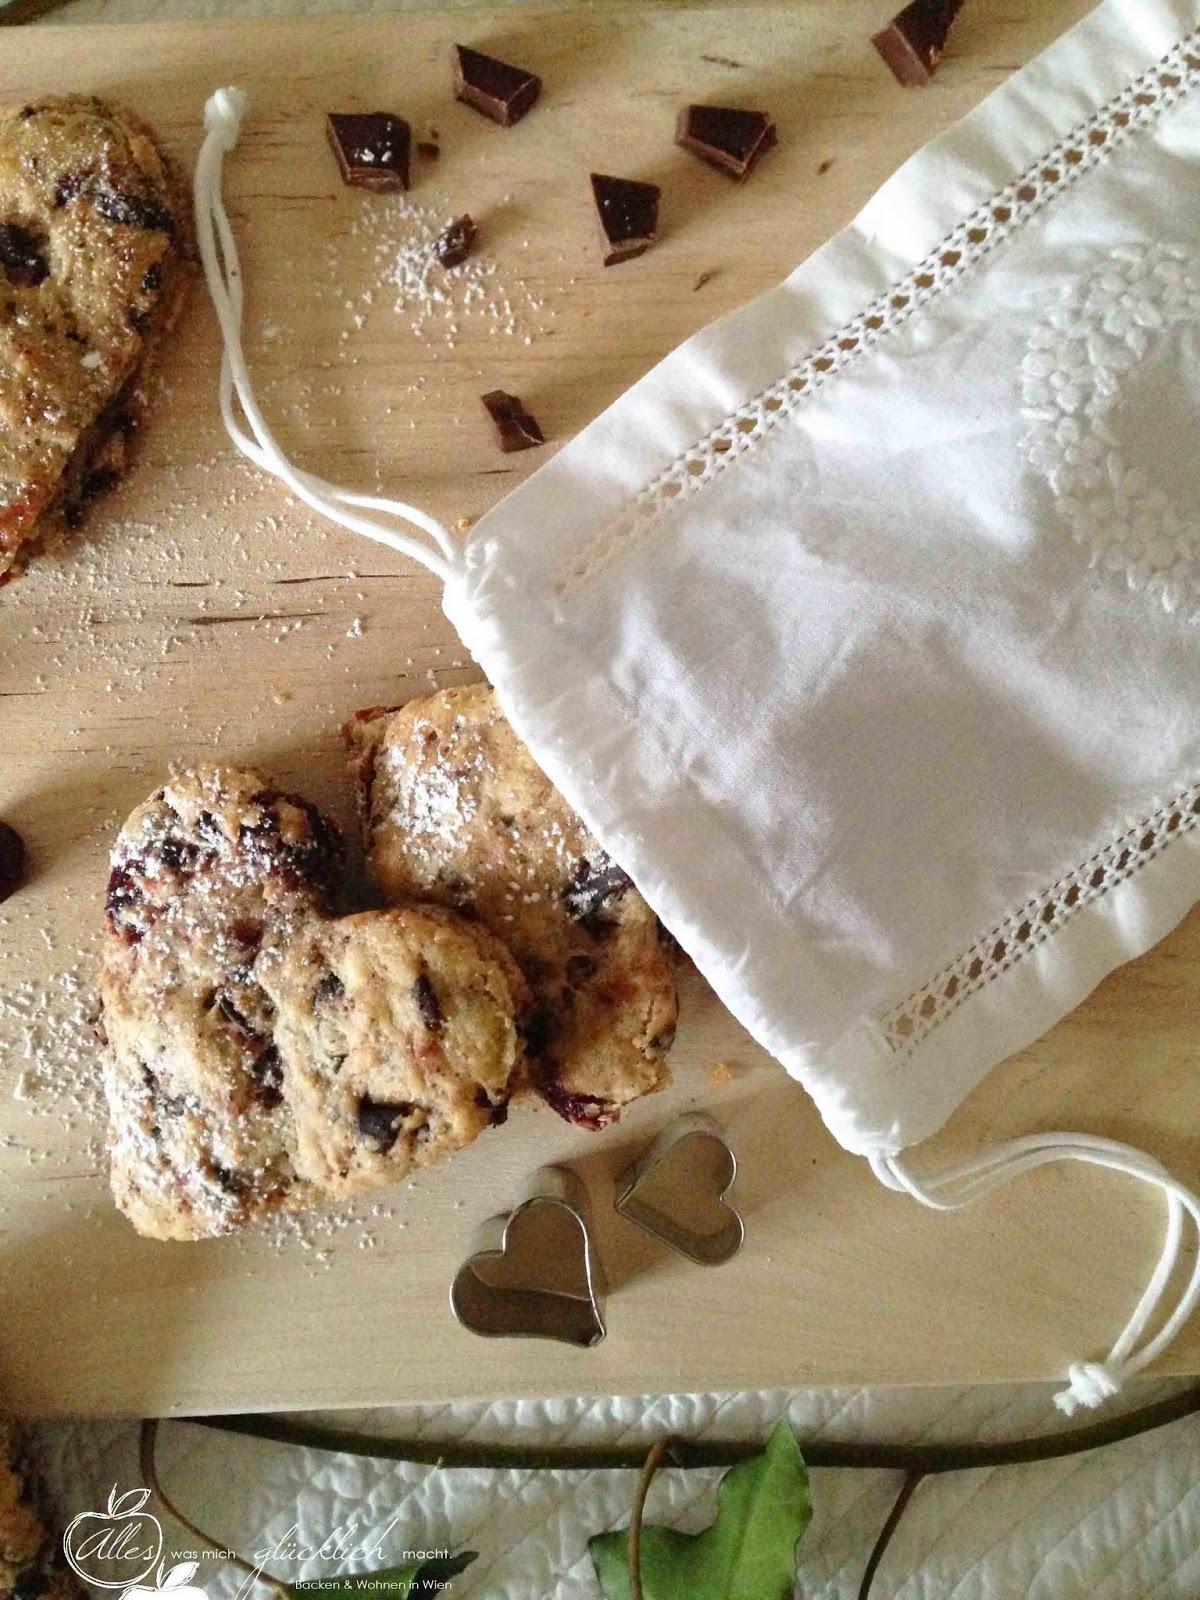 Große Kirschliebe: Schoko-Kirsch-Biscuits